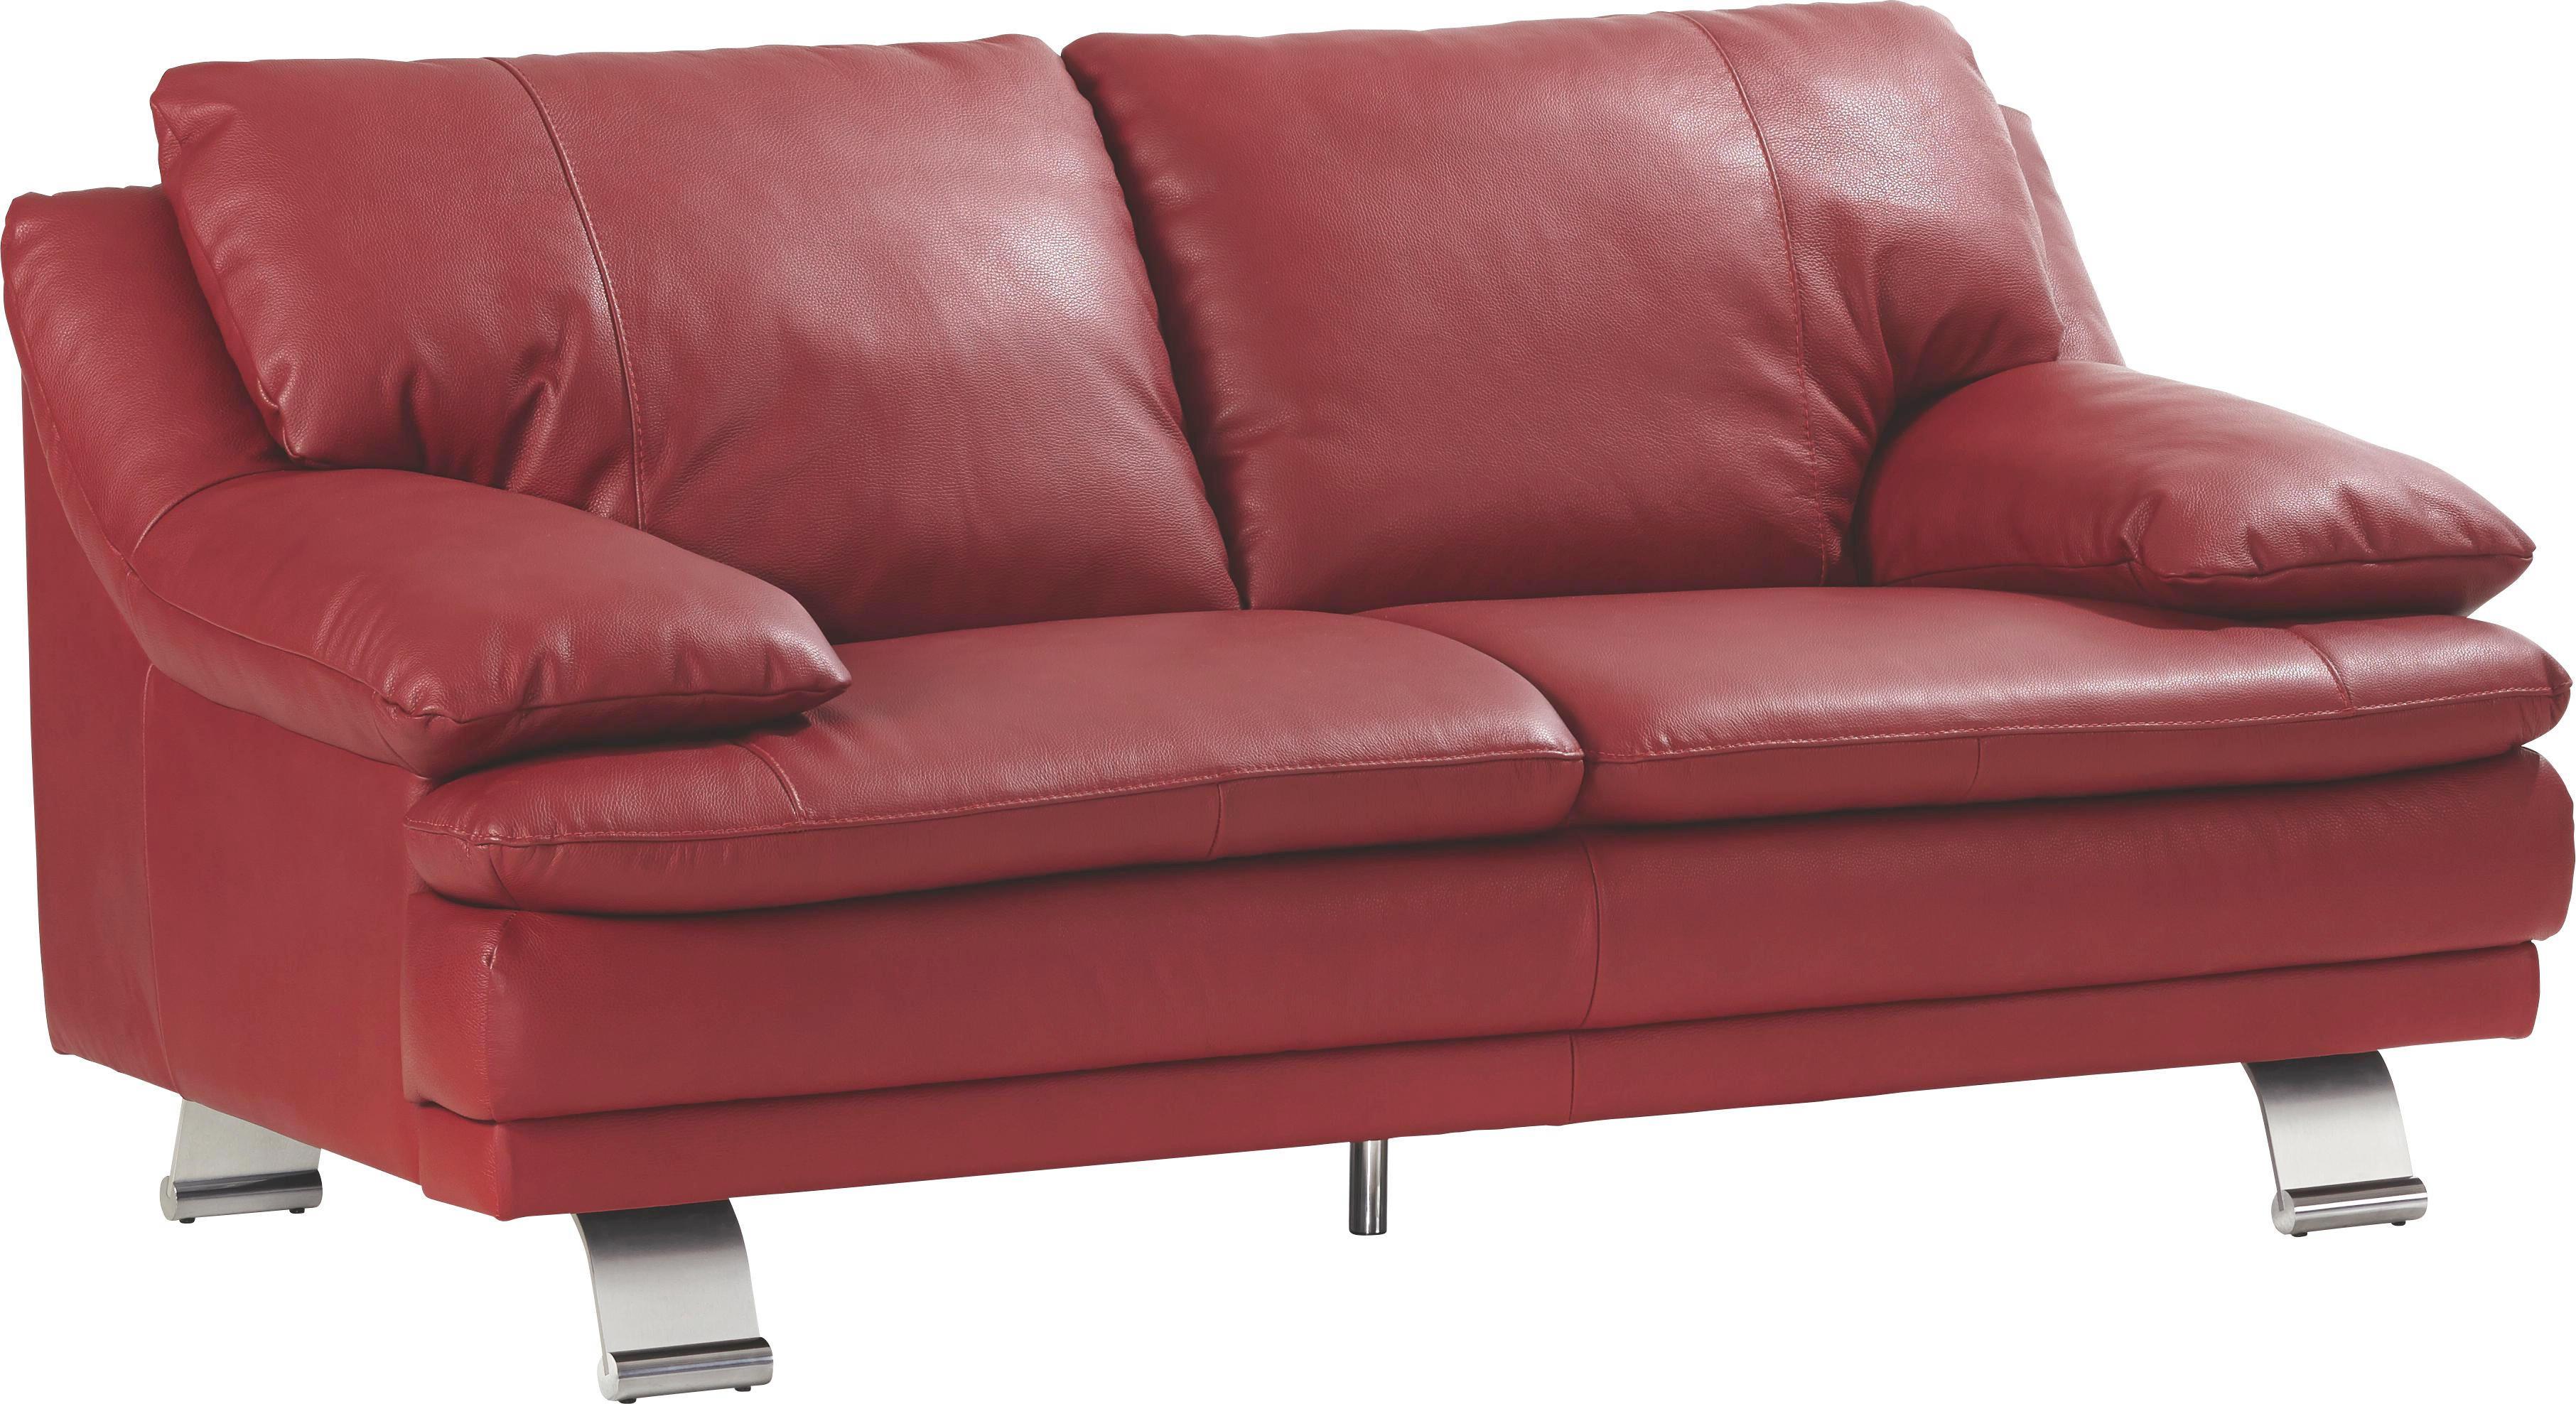 SEDEŽNA GARNITURA - rdeča/barve aluminija, Konvencionalno, kovina/usnje (220/87/94cm) - CELINA HOME